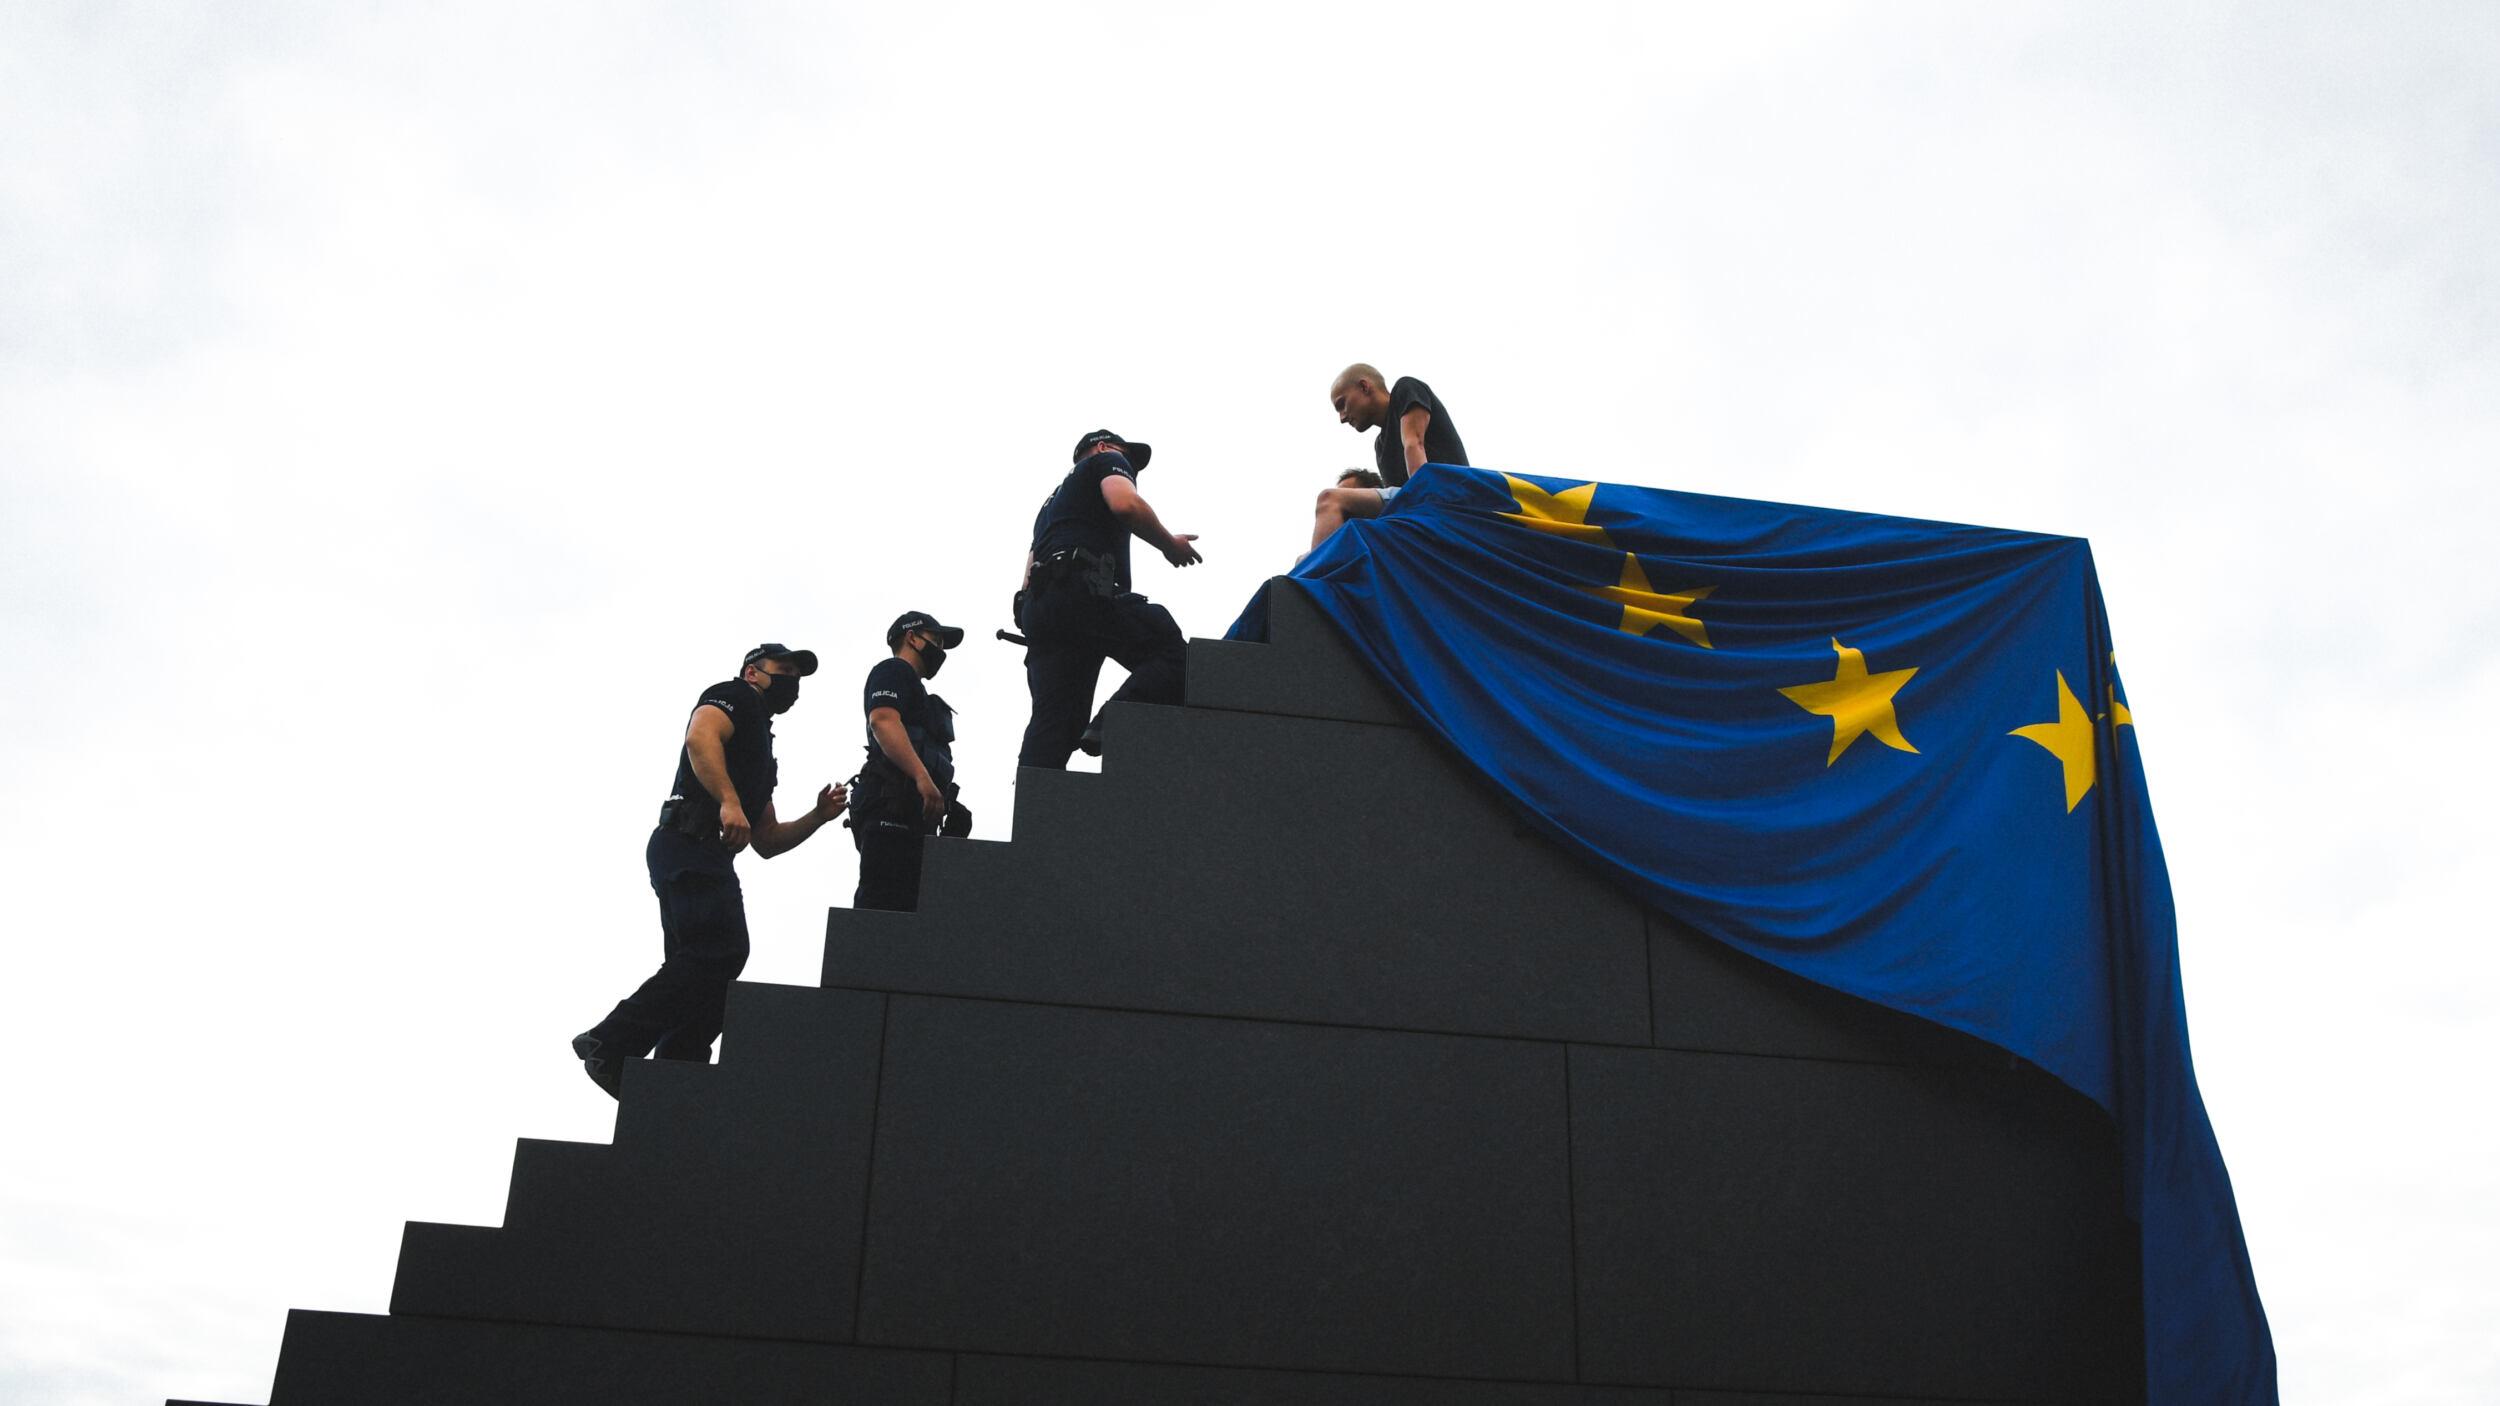 https://oko.press/images/galleries/%E2%80%9Etu-jest-unia-europejska-tu-jest-polska-%E2%80%93-lbo-wiesza-flage-ue-na-pomniku-smolenskim-408058/20210722-rku-lbo-flagaue-pomnik-smol-018-2500x1406.jpg